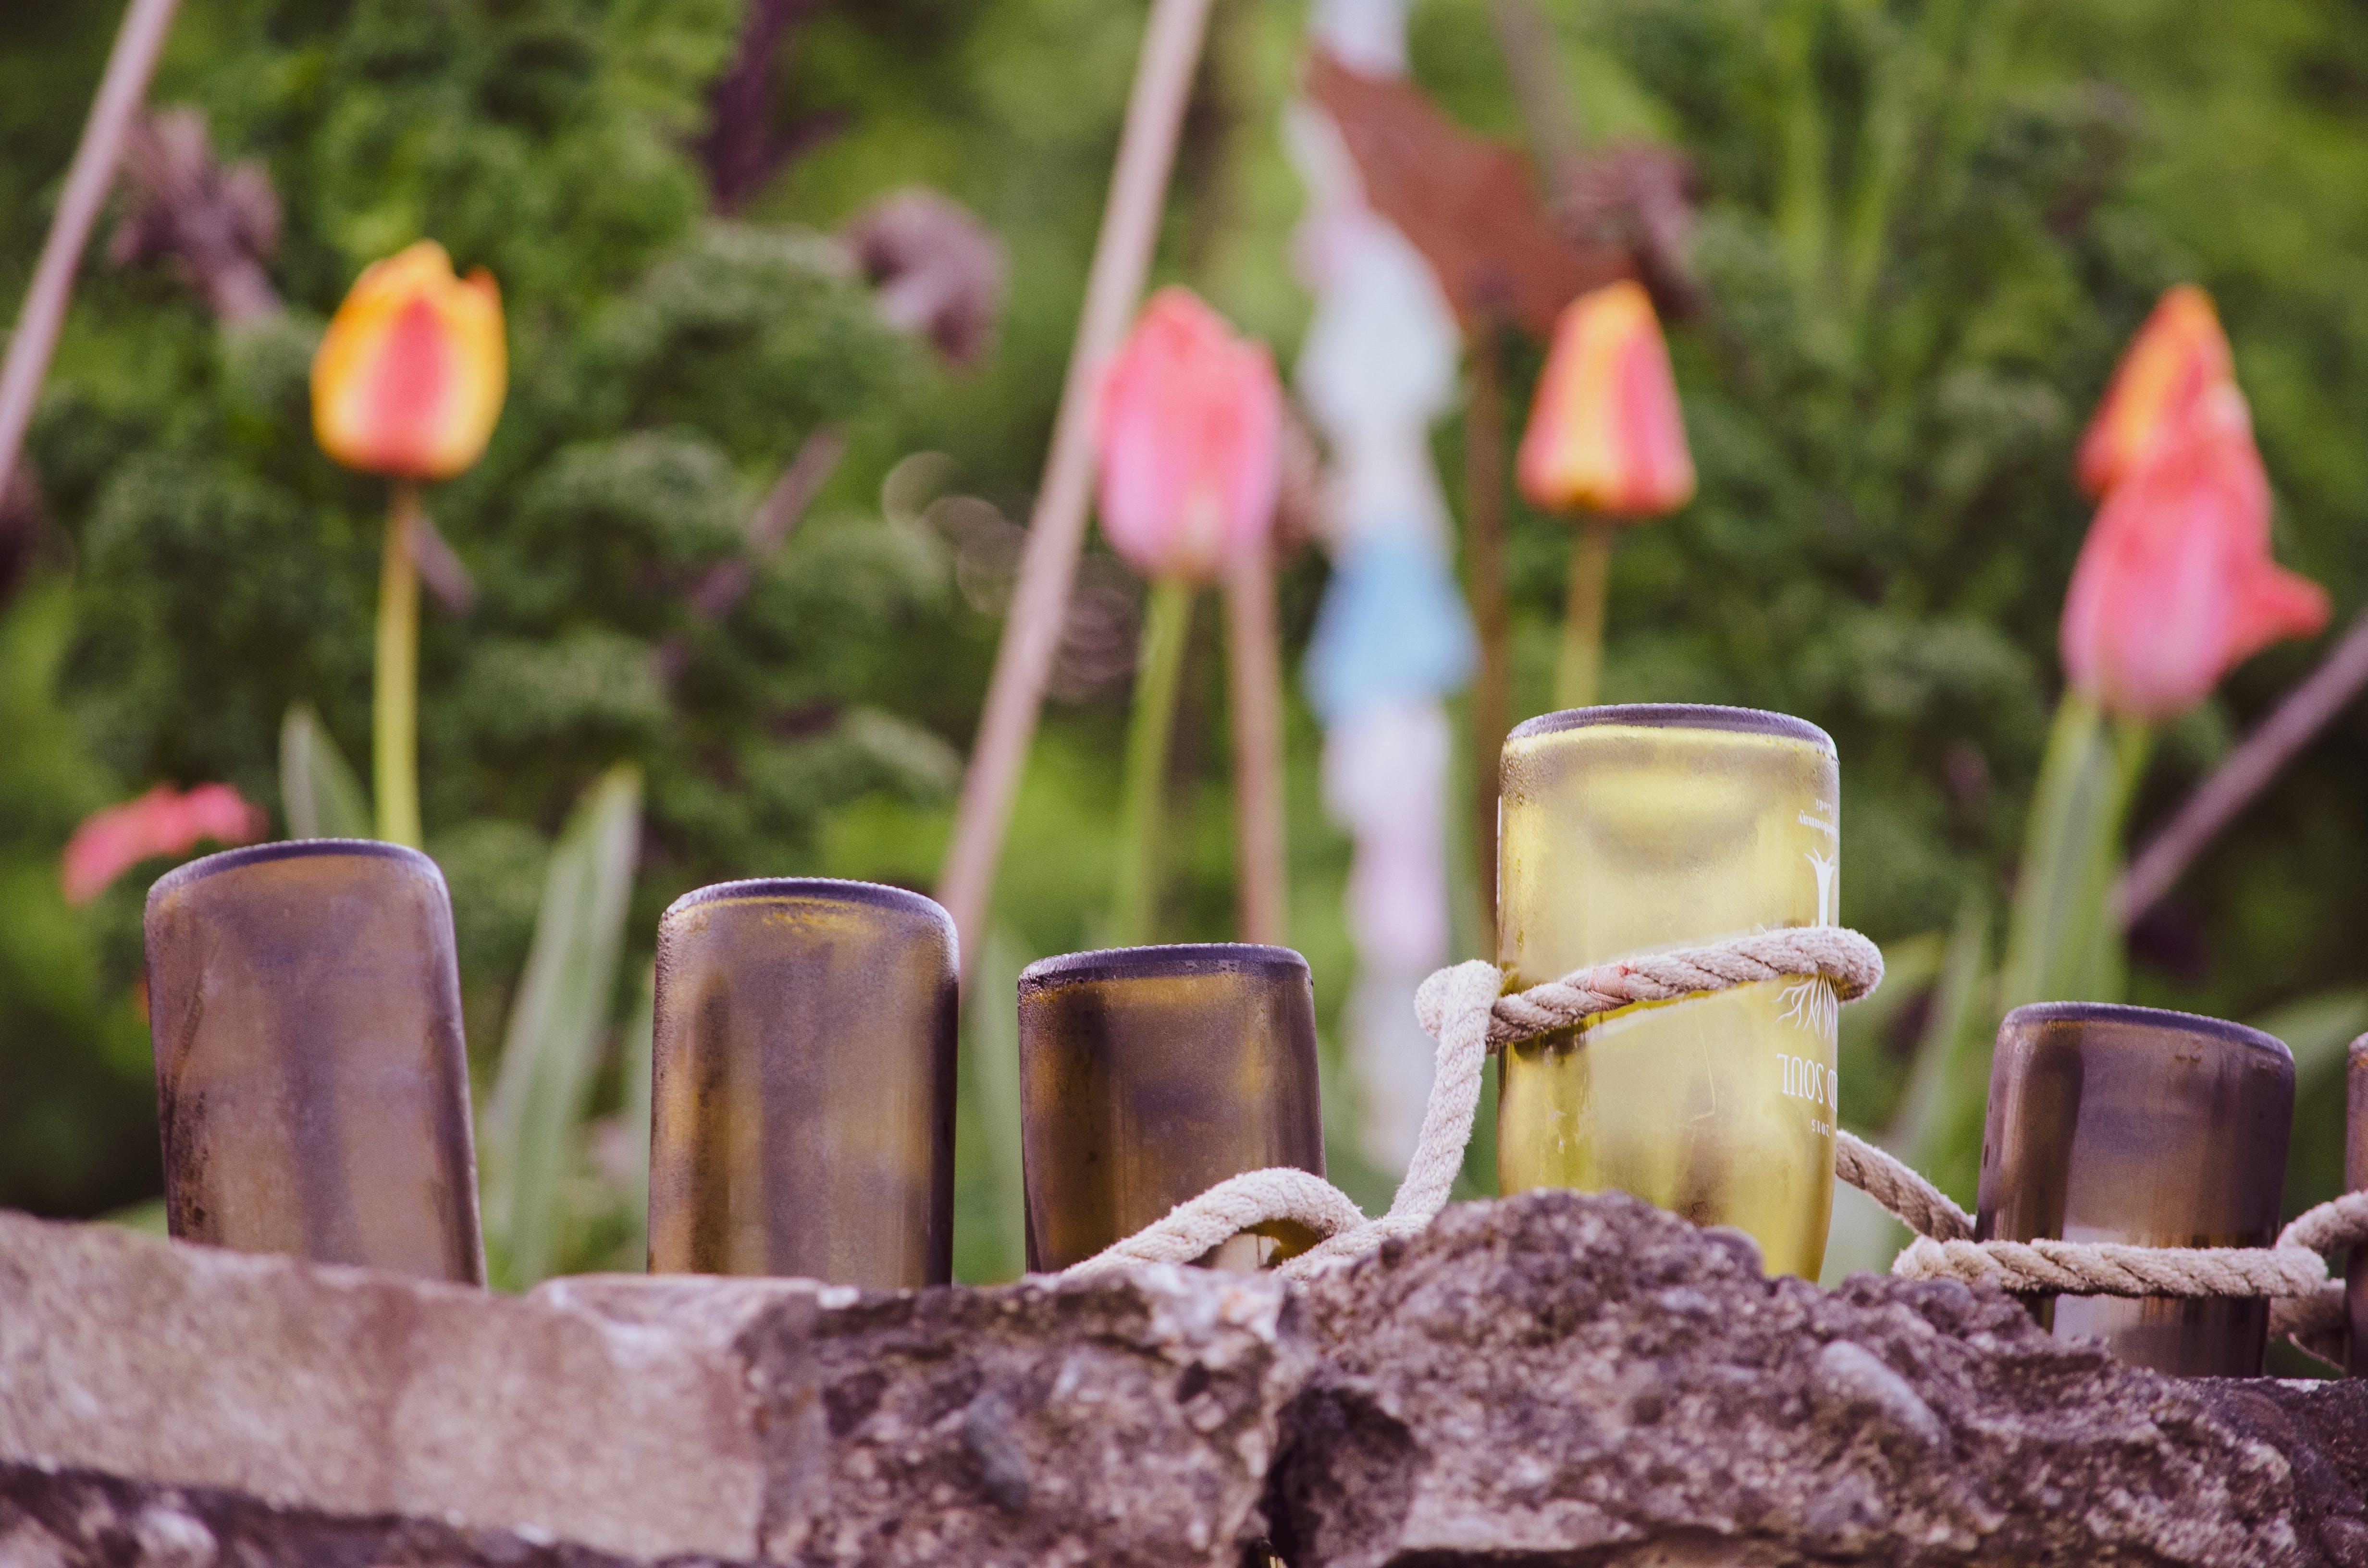 Free stock photo of flowers, garden, mason jars, pink tulip